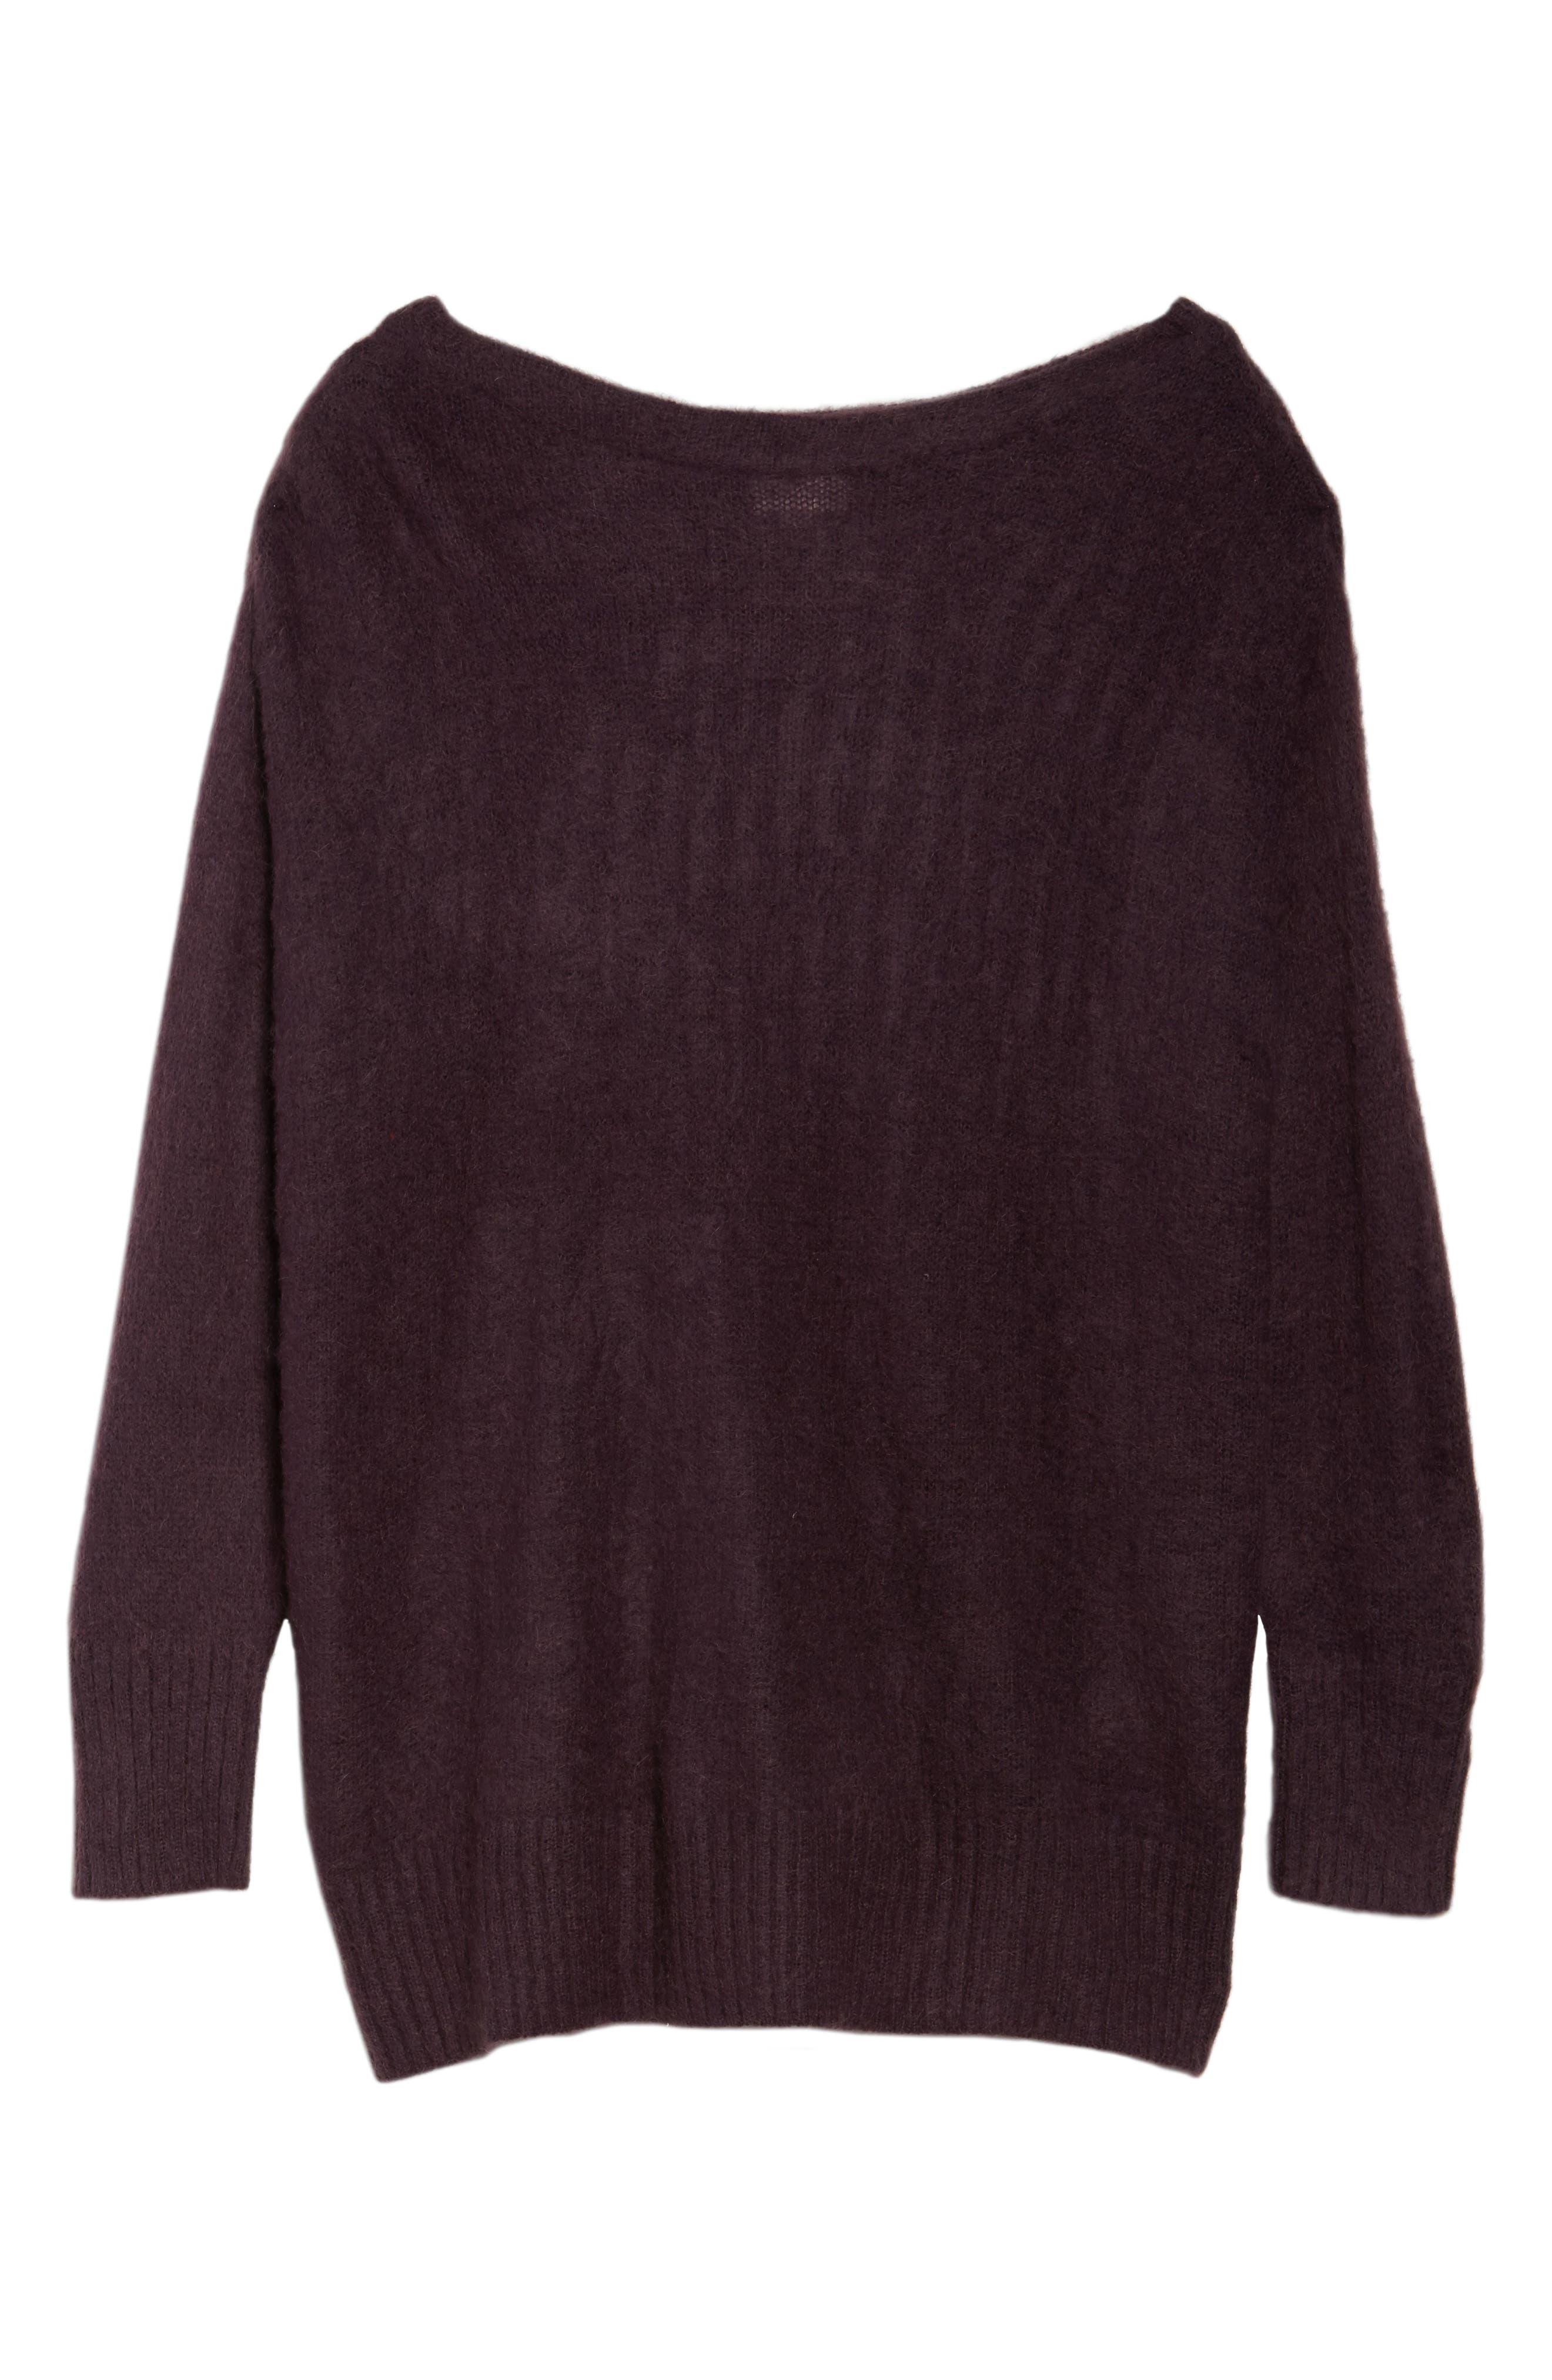 Long Sleeve Brushed Sweater,                             Alternate thumbnail 6, color,                             Purple Plum